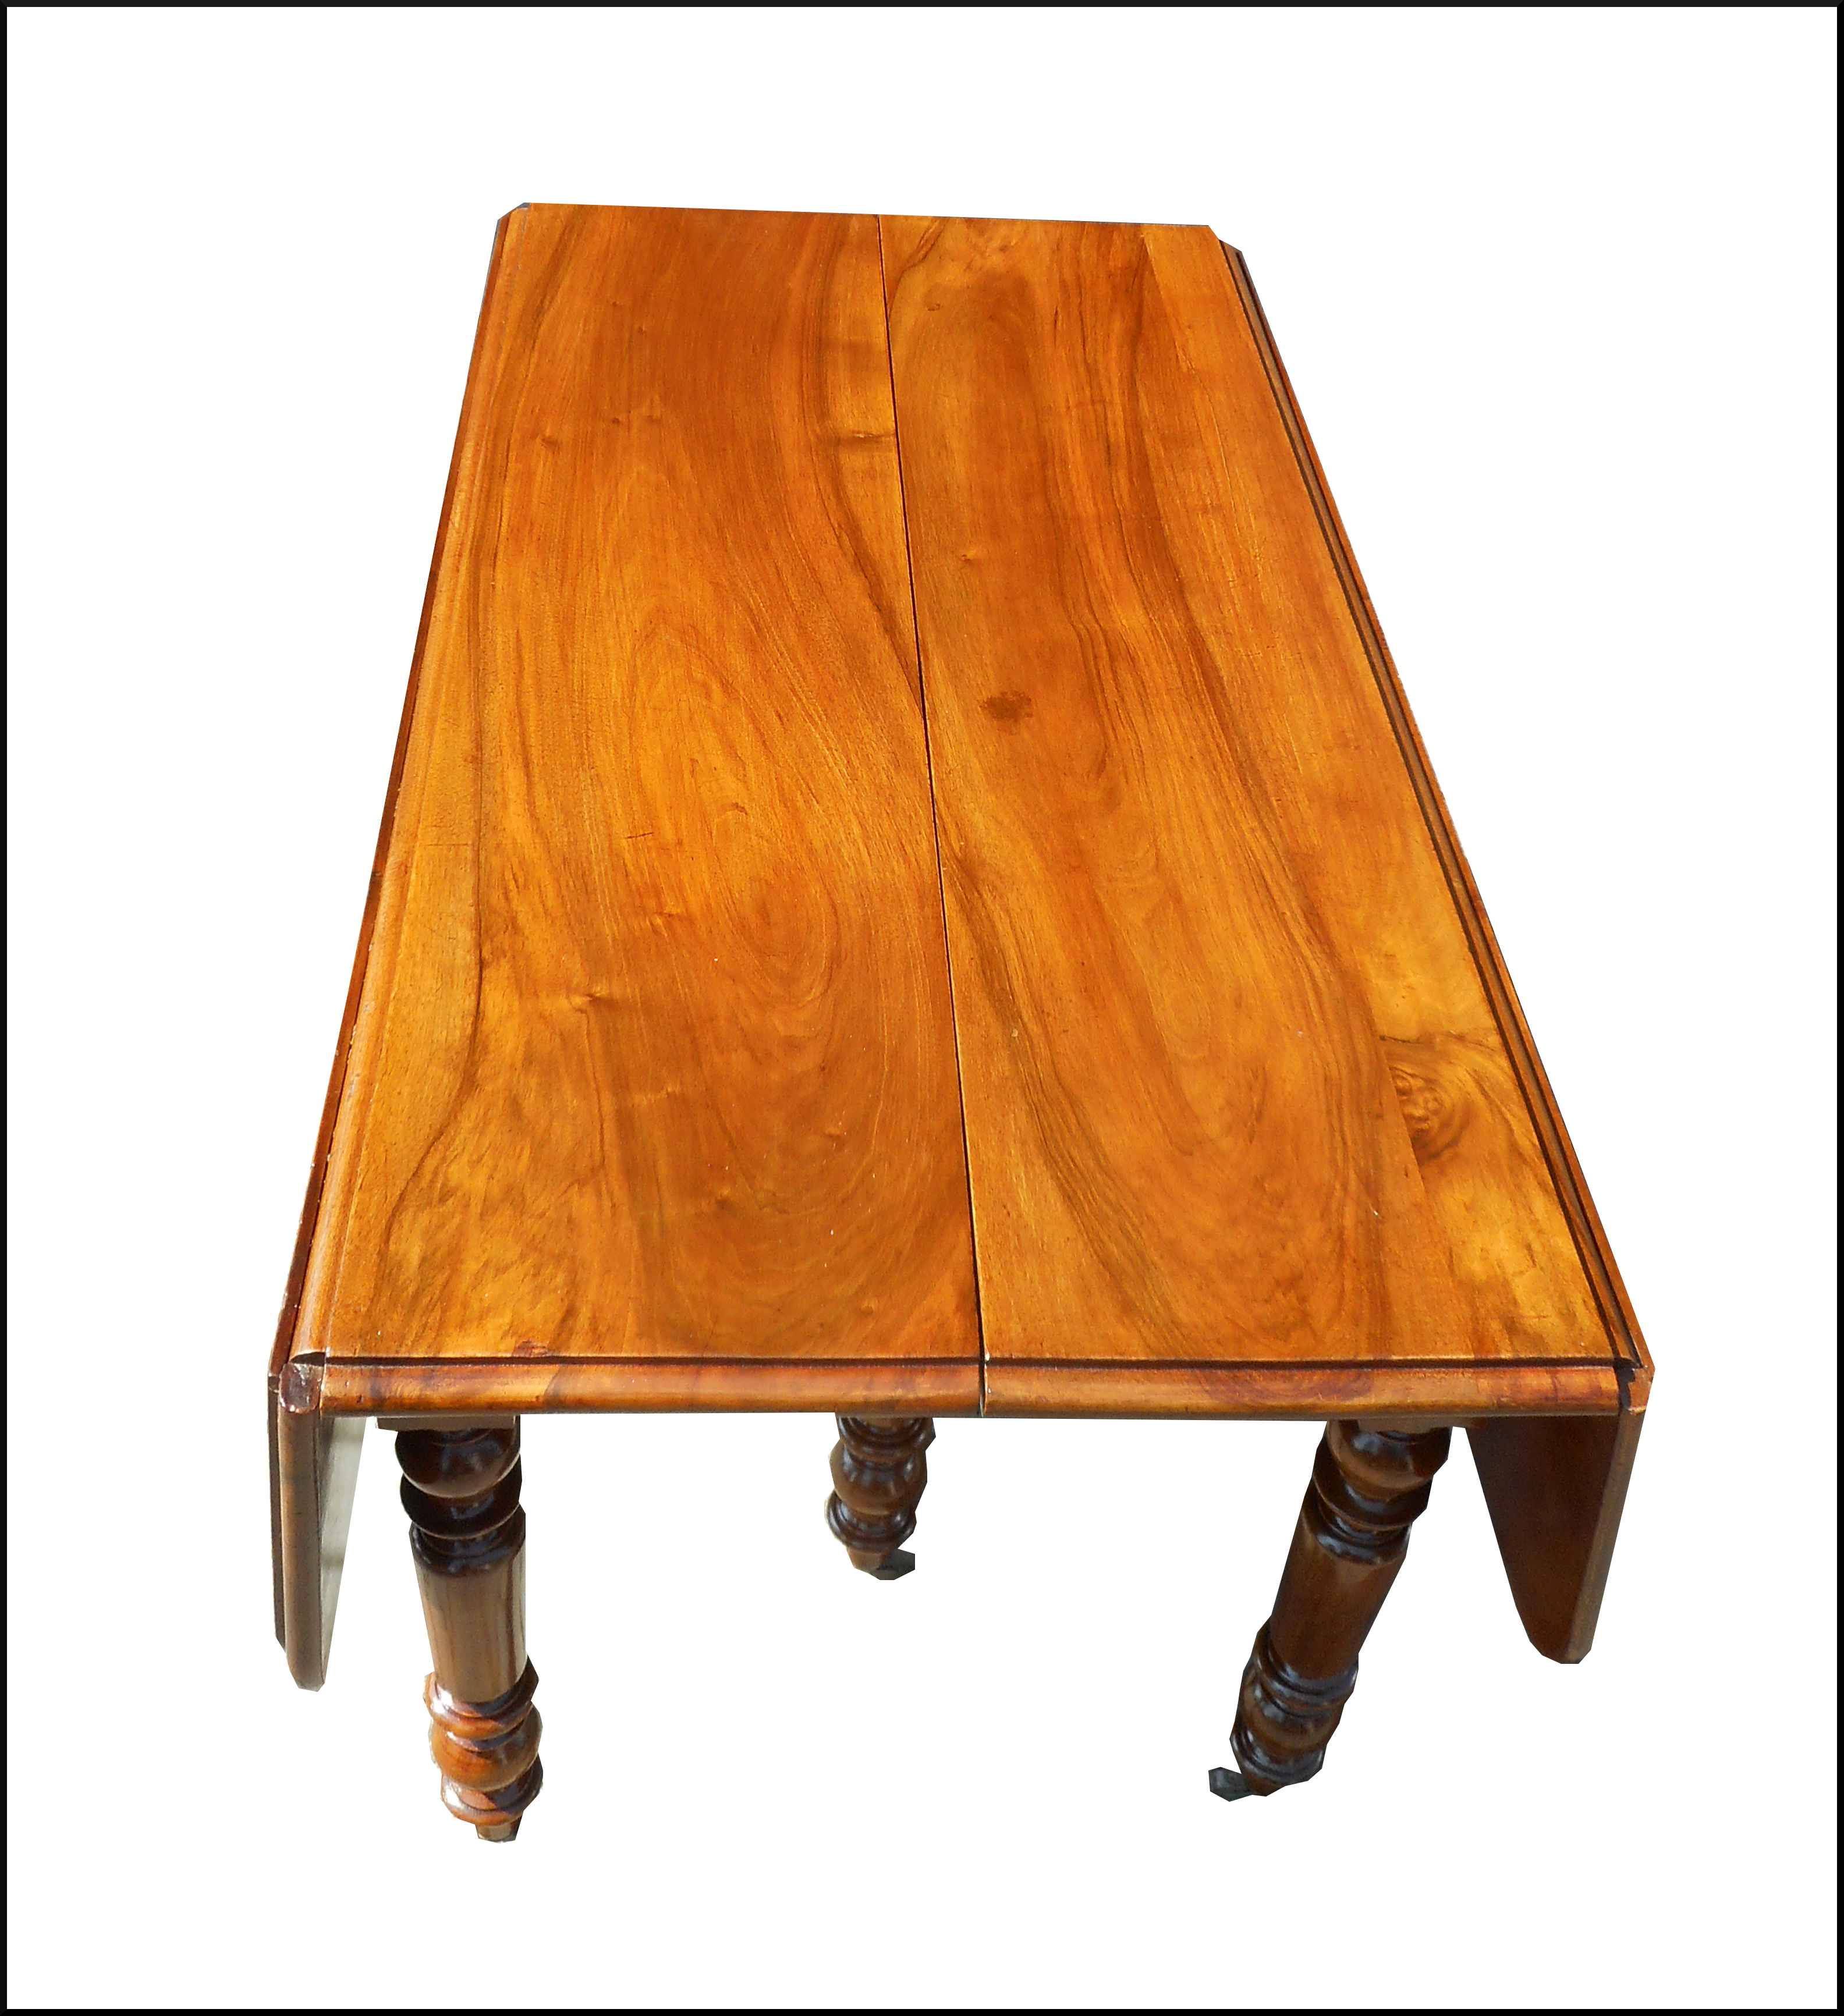 Tavolo a bandelle con gamba tornita